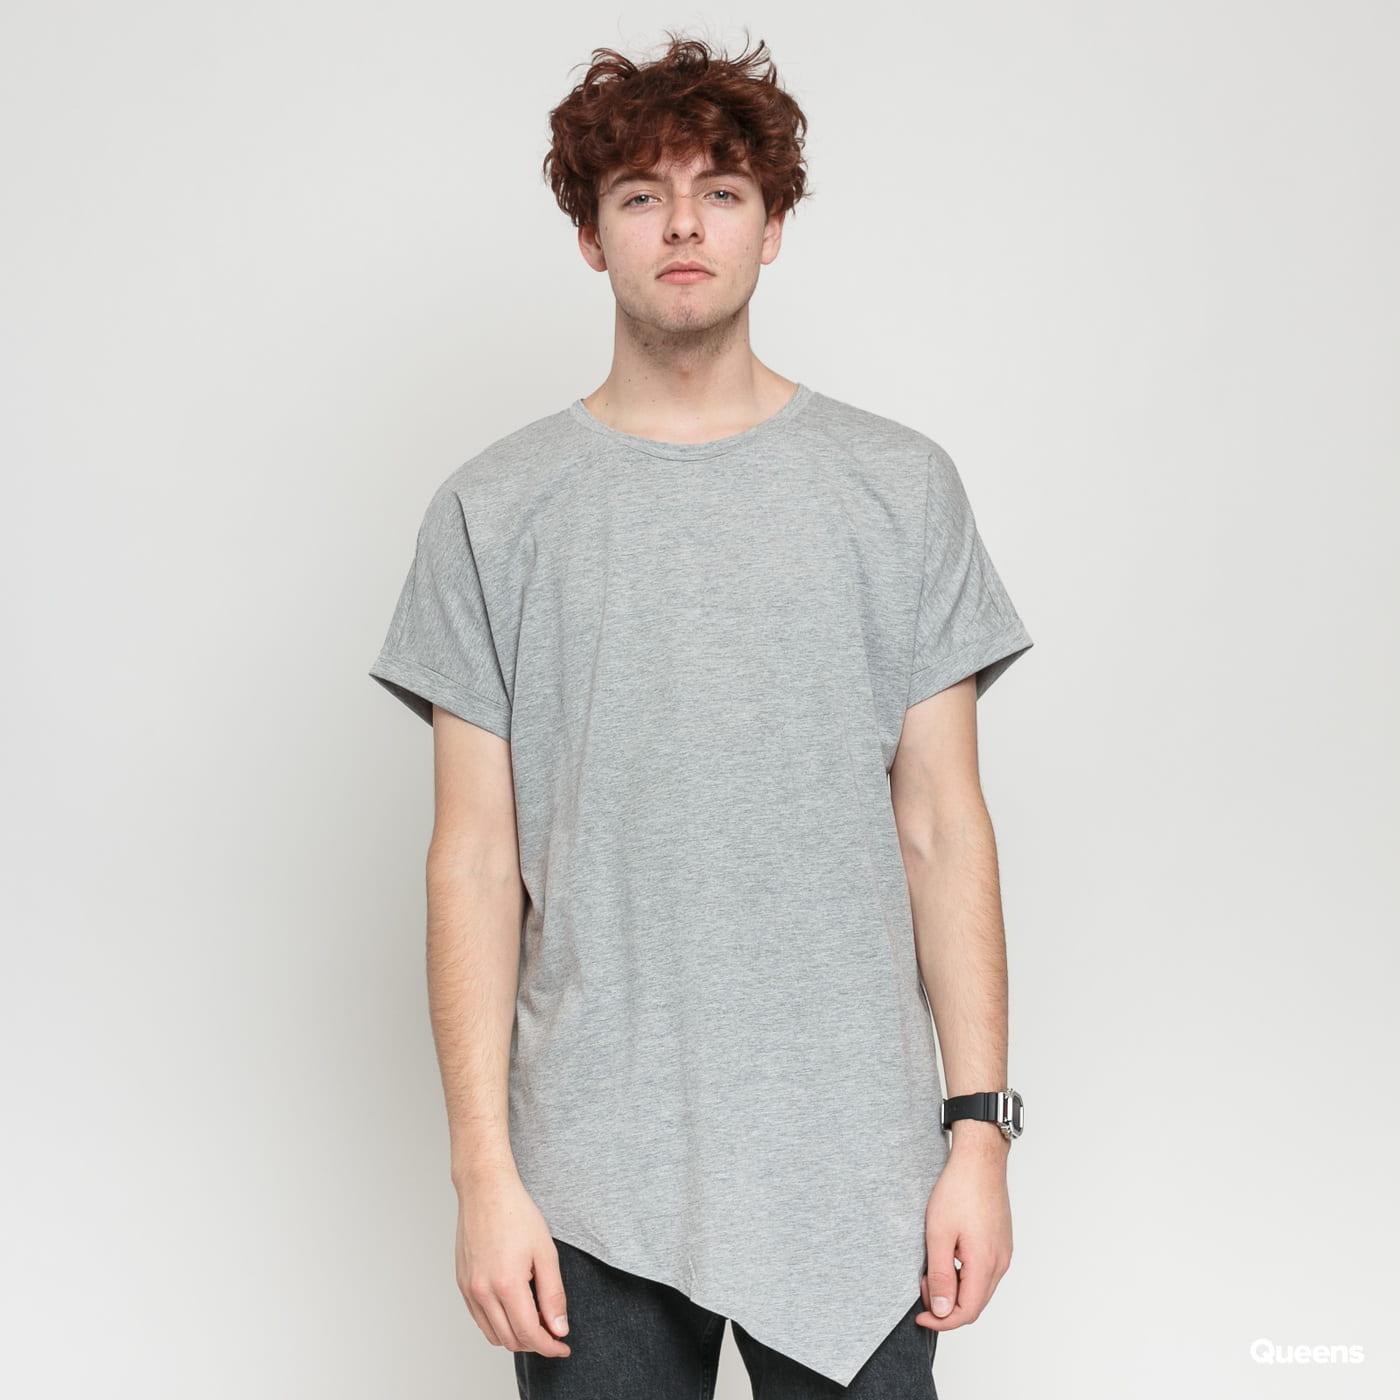 Urban Classics Asymetric Long Tee melange gray